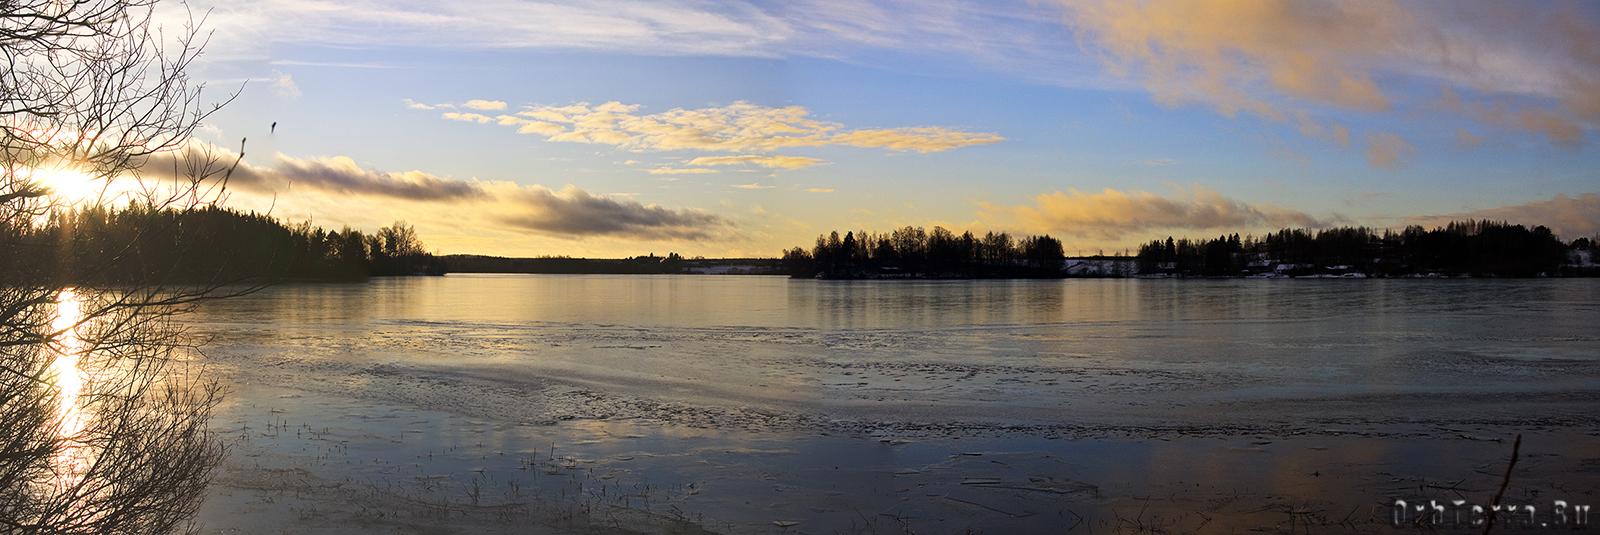 Панорама озера Курёсиярви